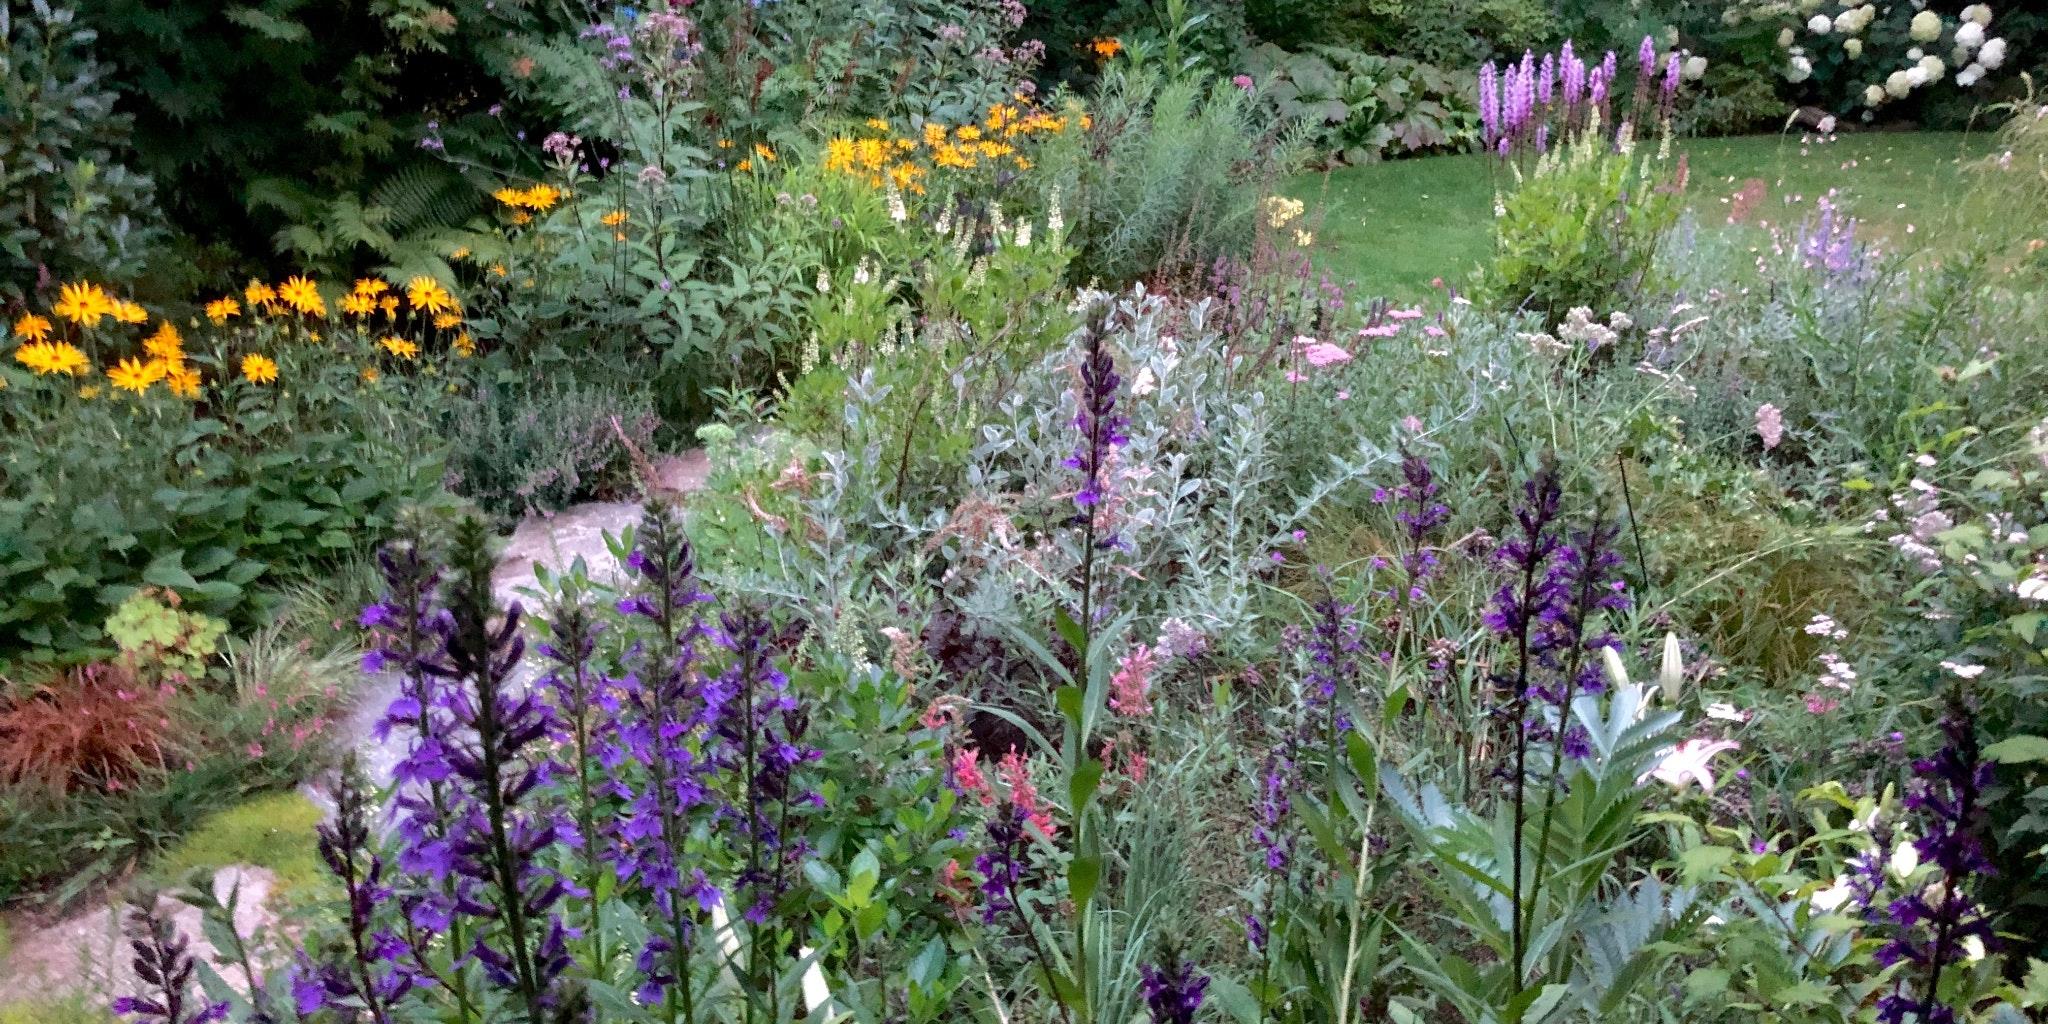 Peter Lavagnino Garden Design and Management